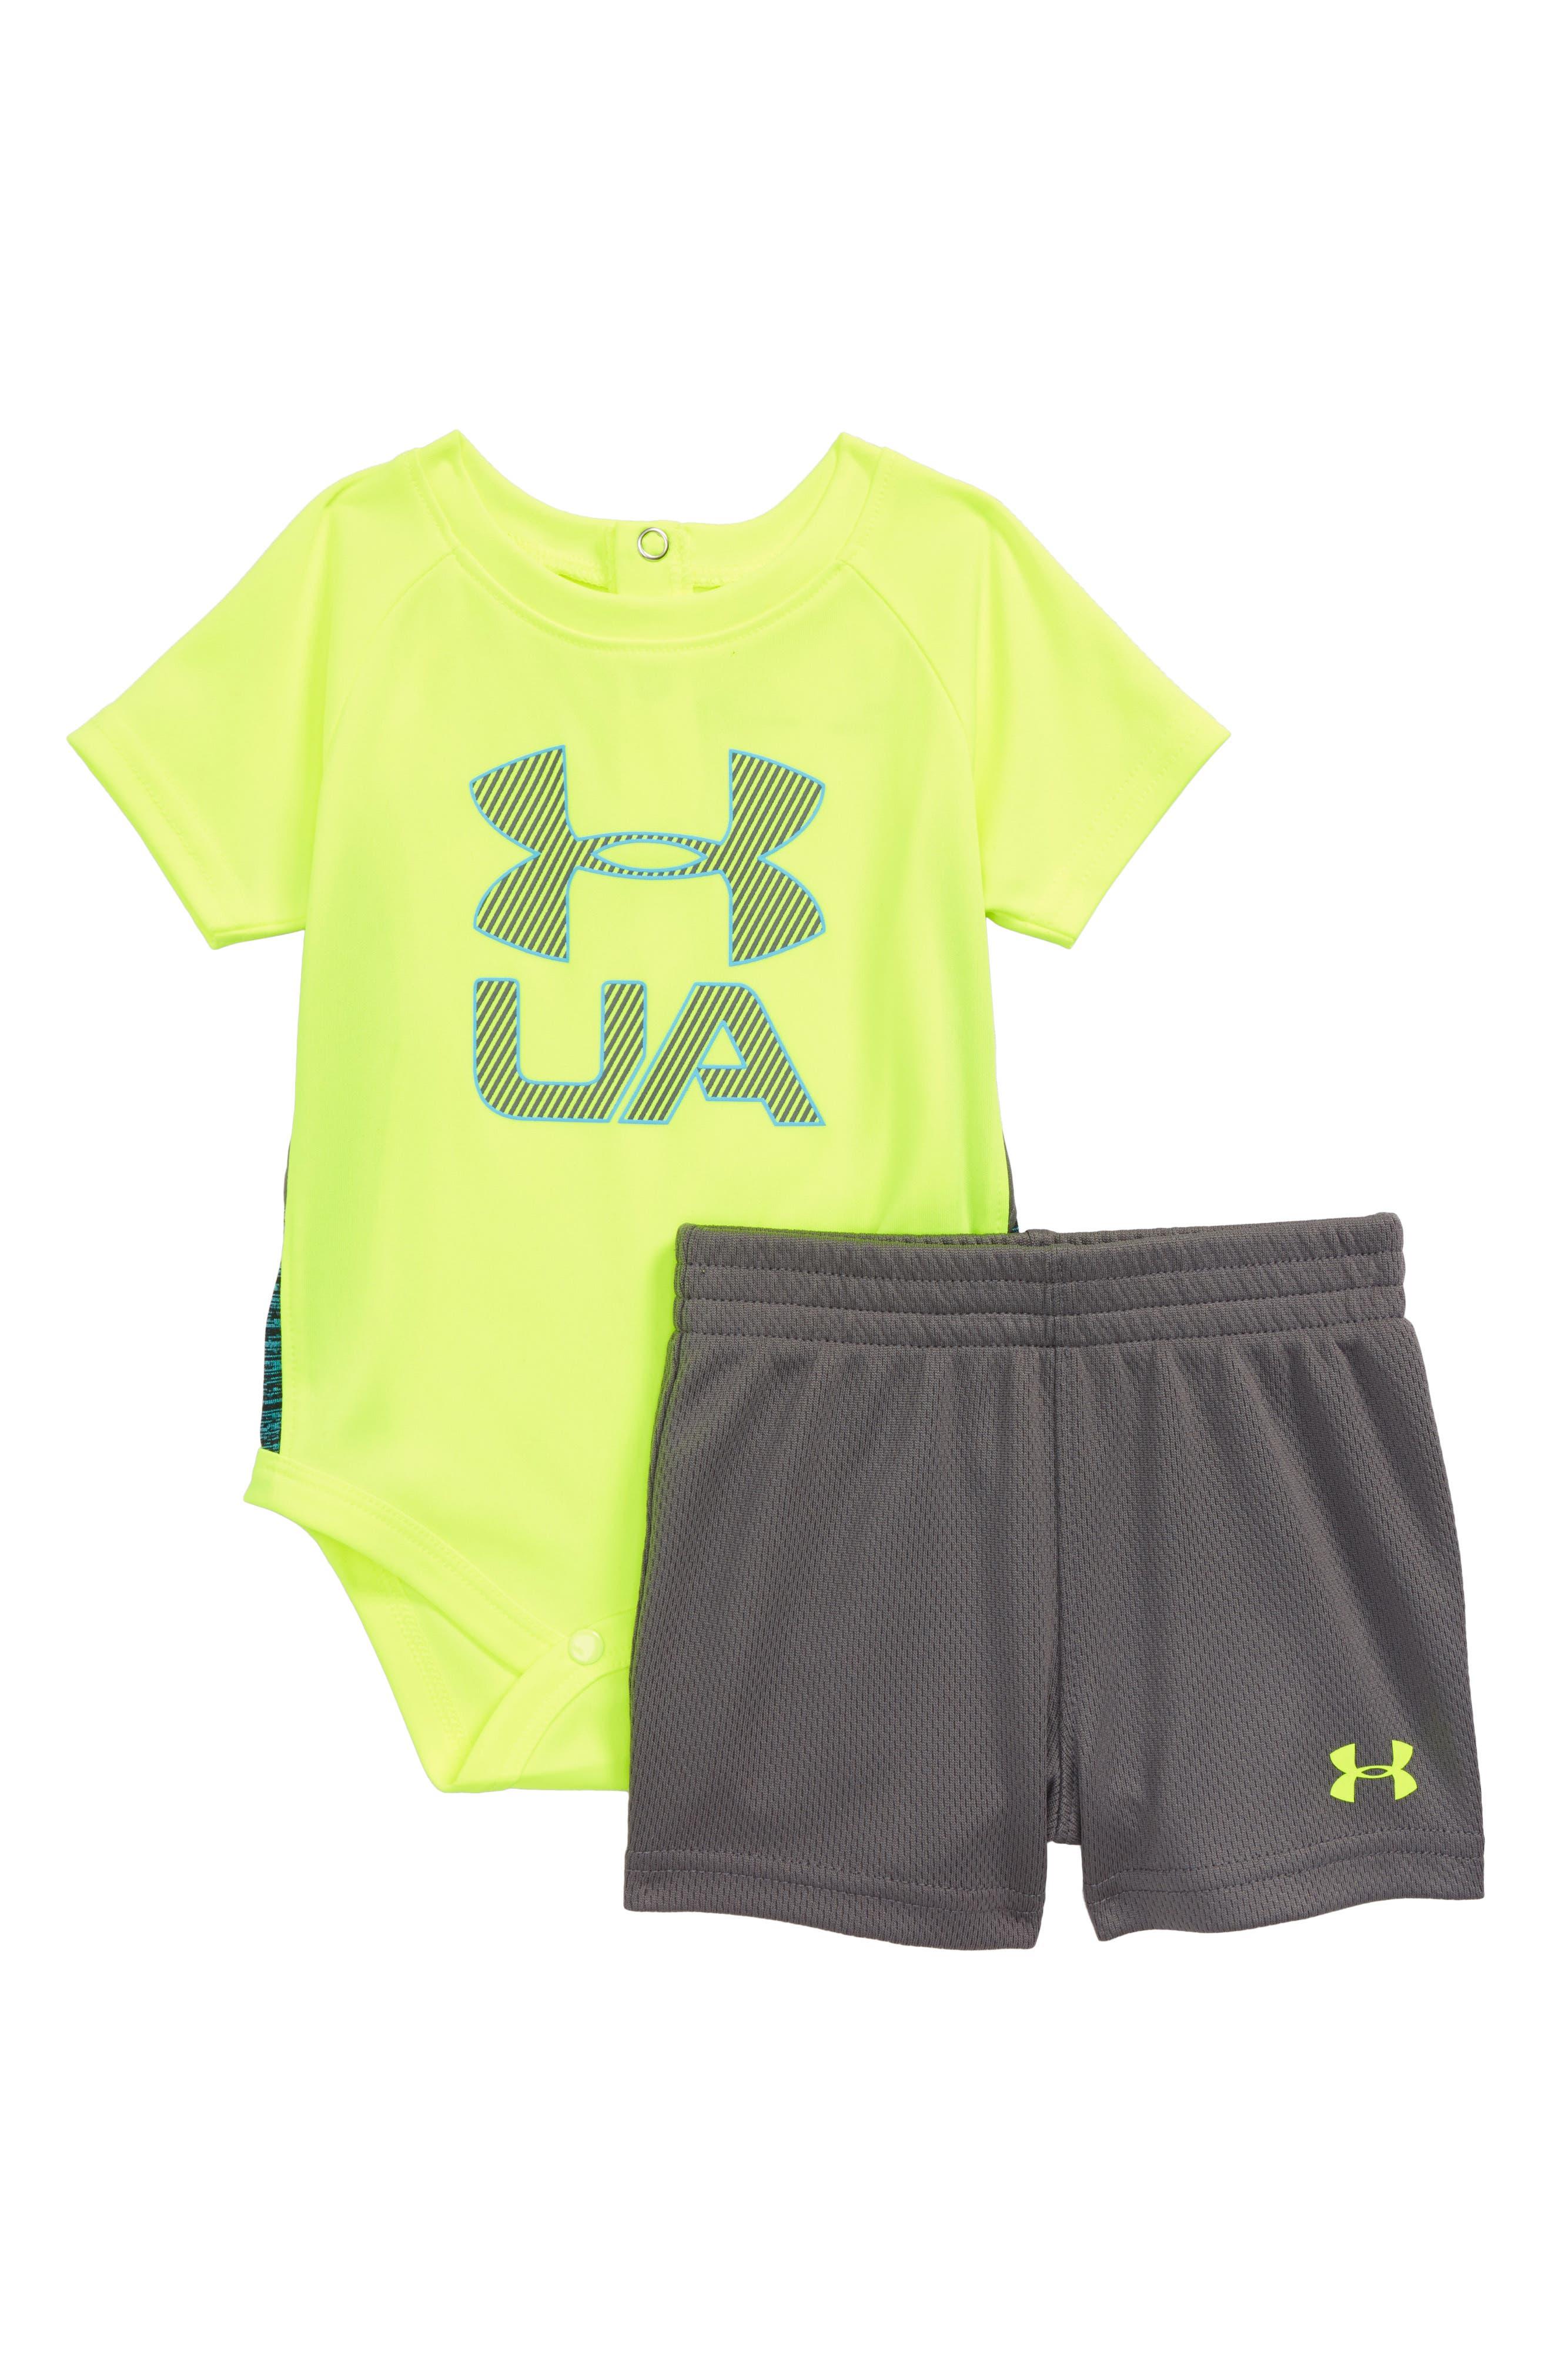 Sportster Bodysuit & Shorts Set,                             Main thumbnail 1, color,                             Hi Vis Yellow